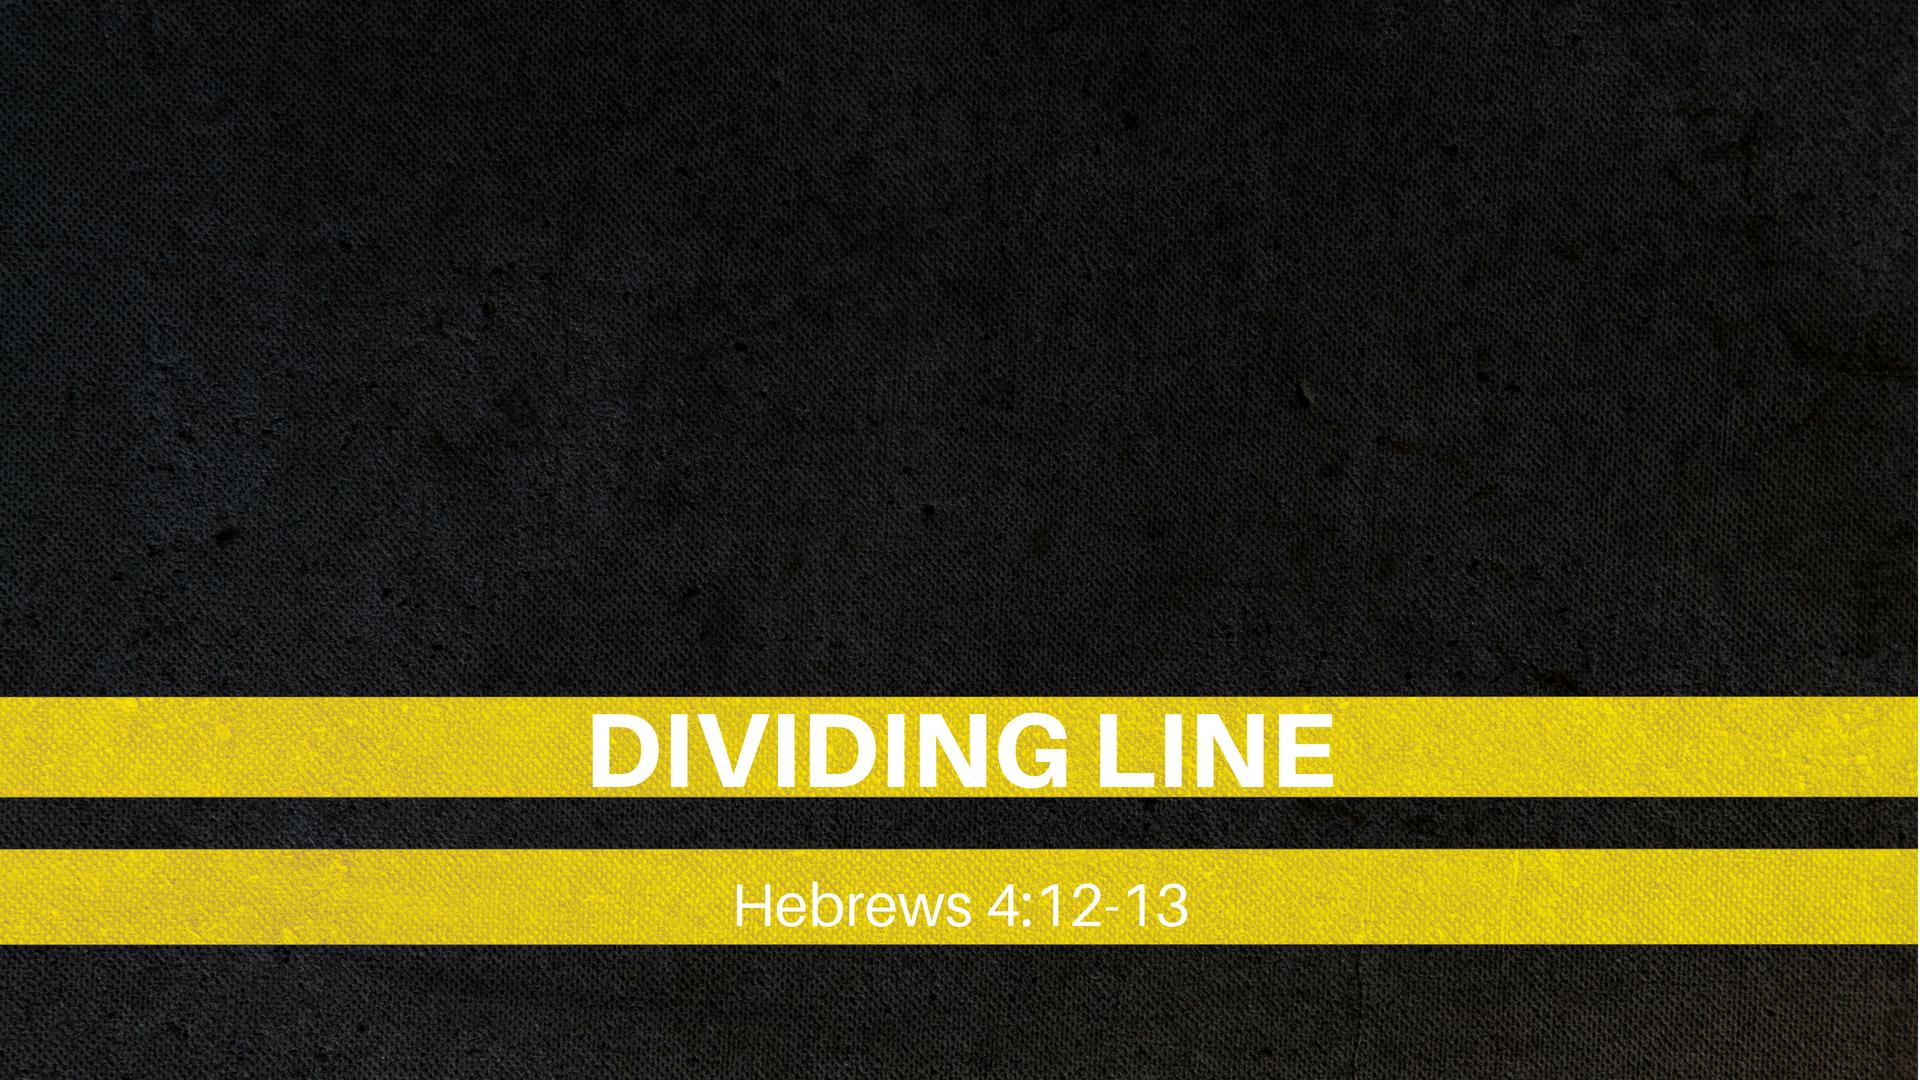 DividingLine.jpg